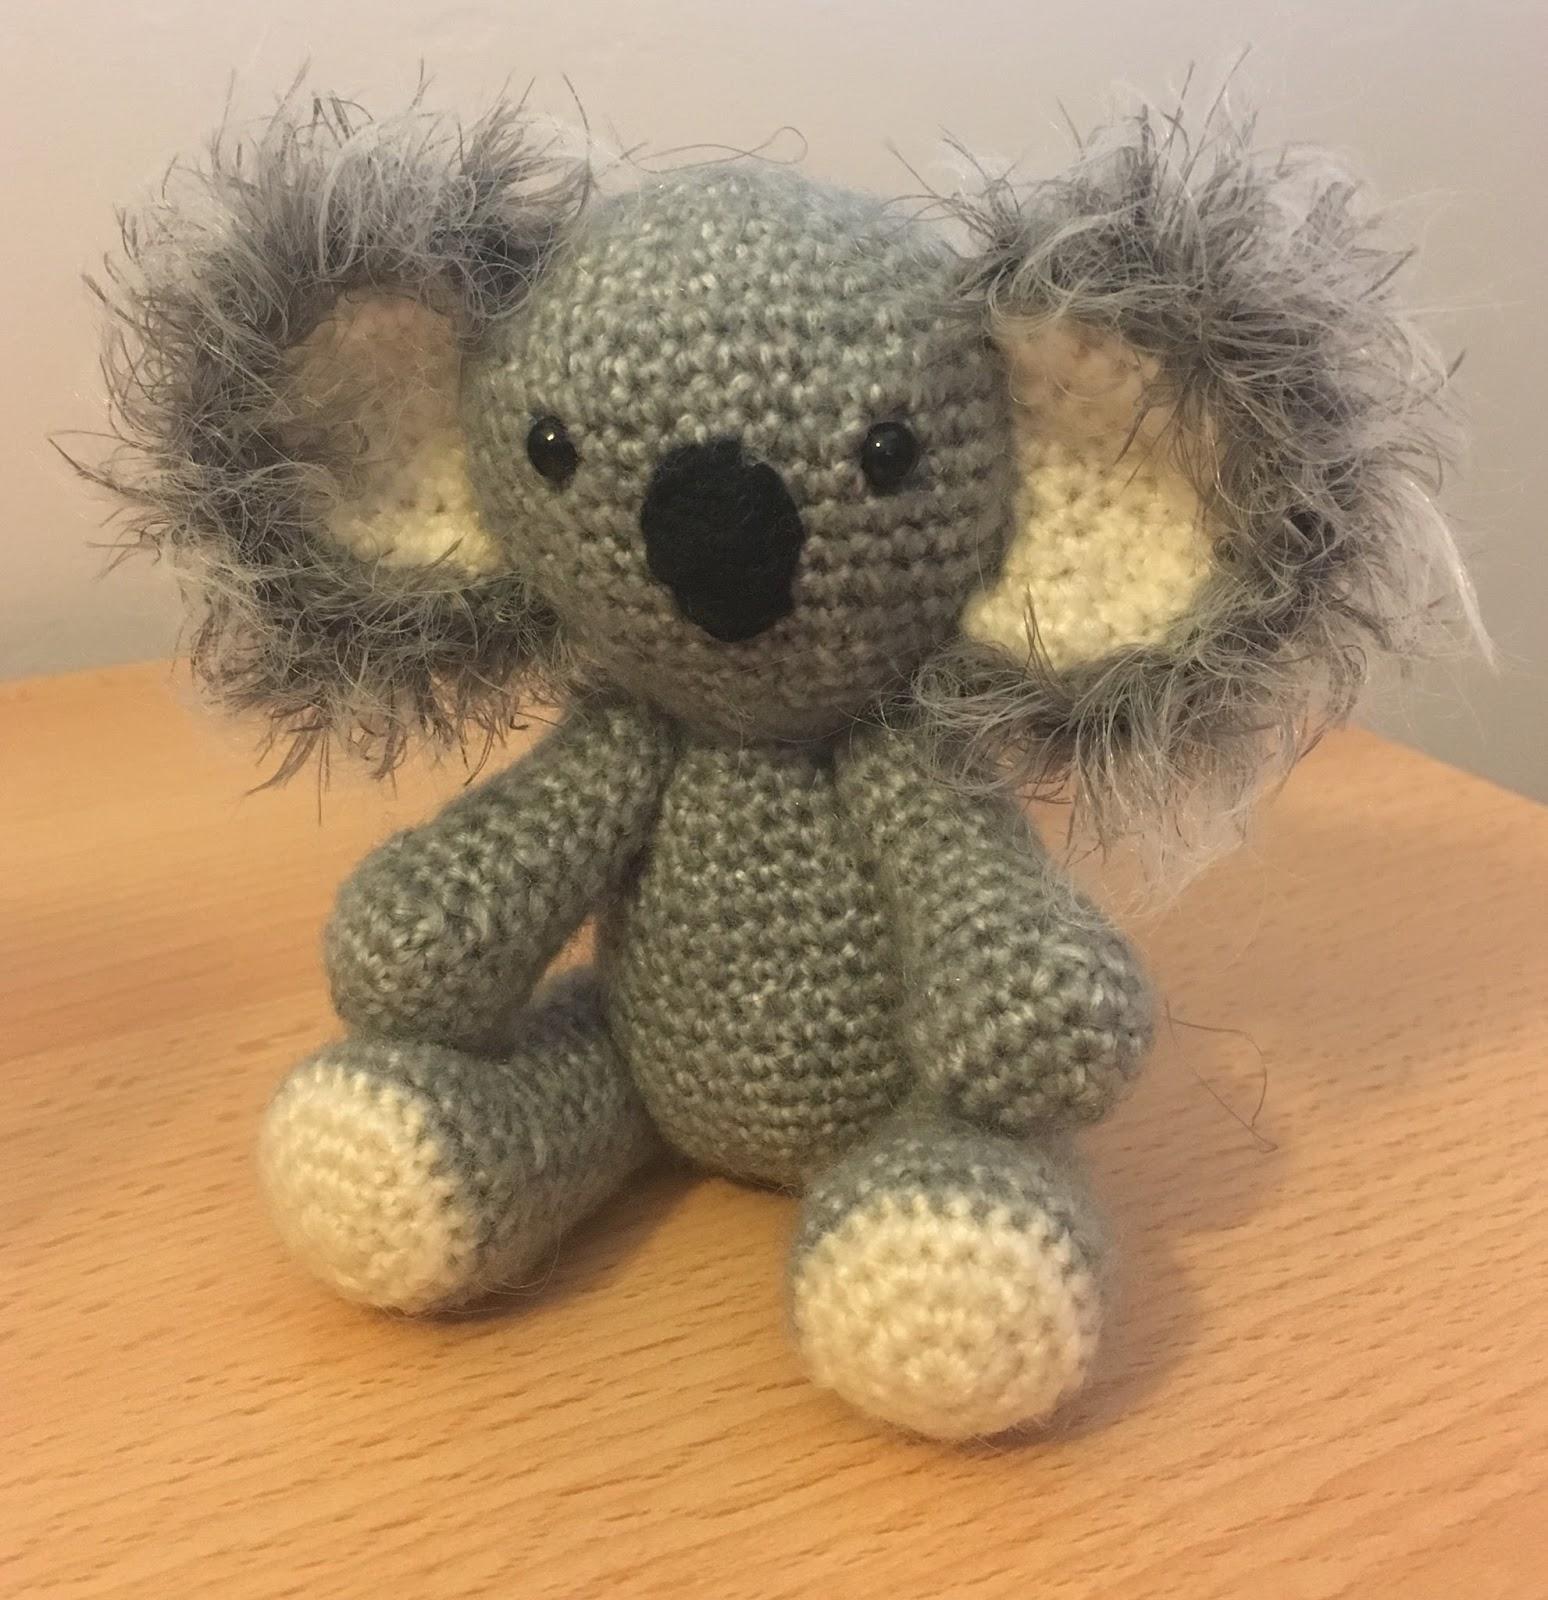 Amigurumi Koala Free Crochet Pattern | 1600x1548